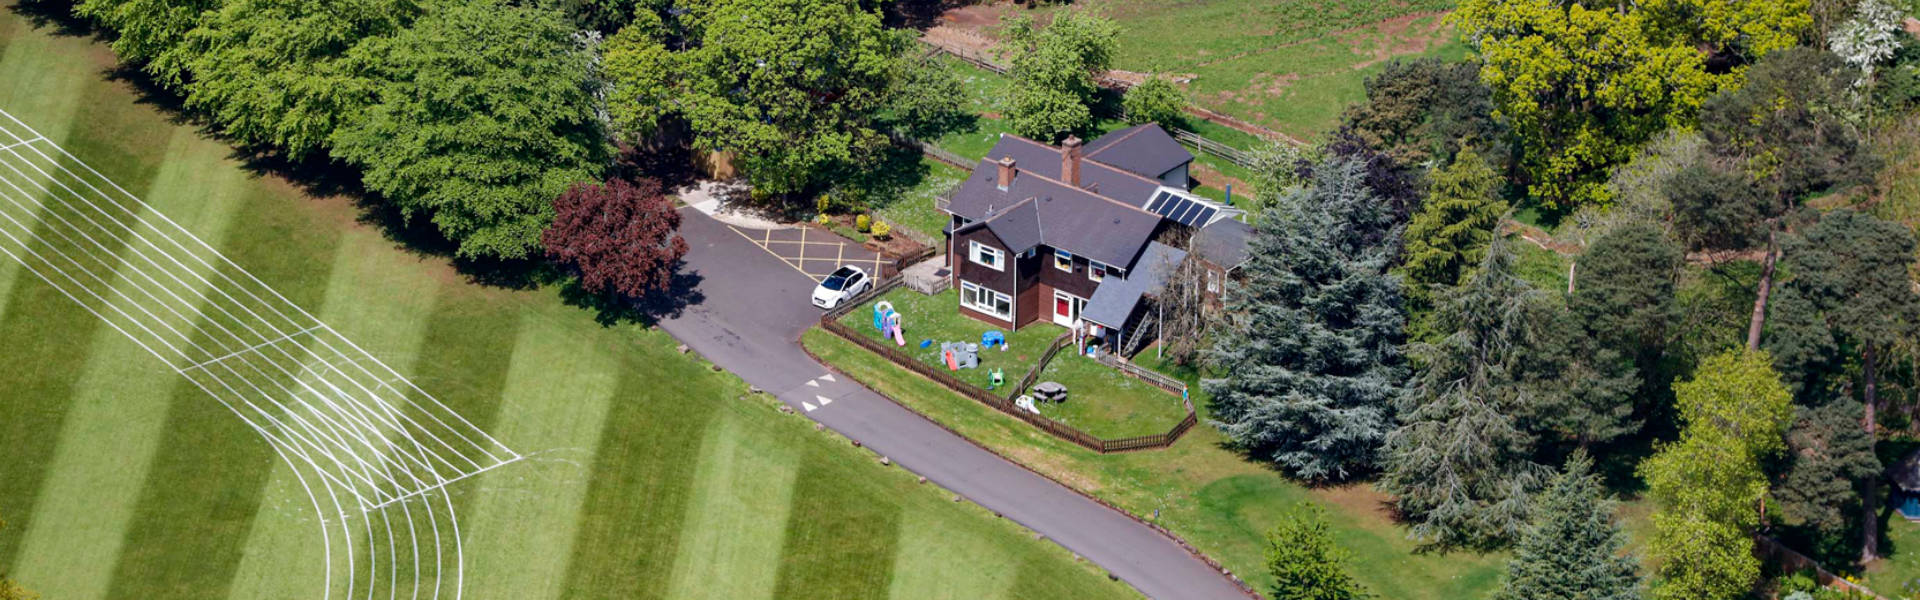 WF Nursery aerial shot